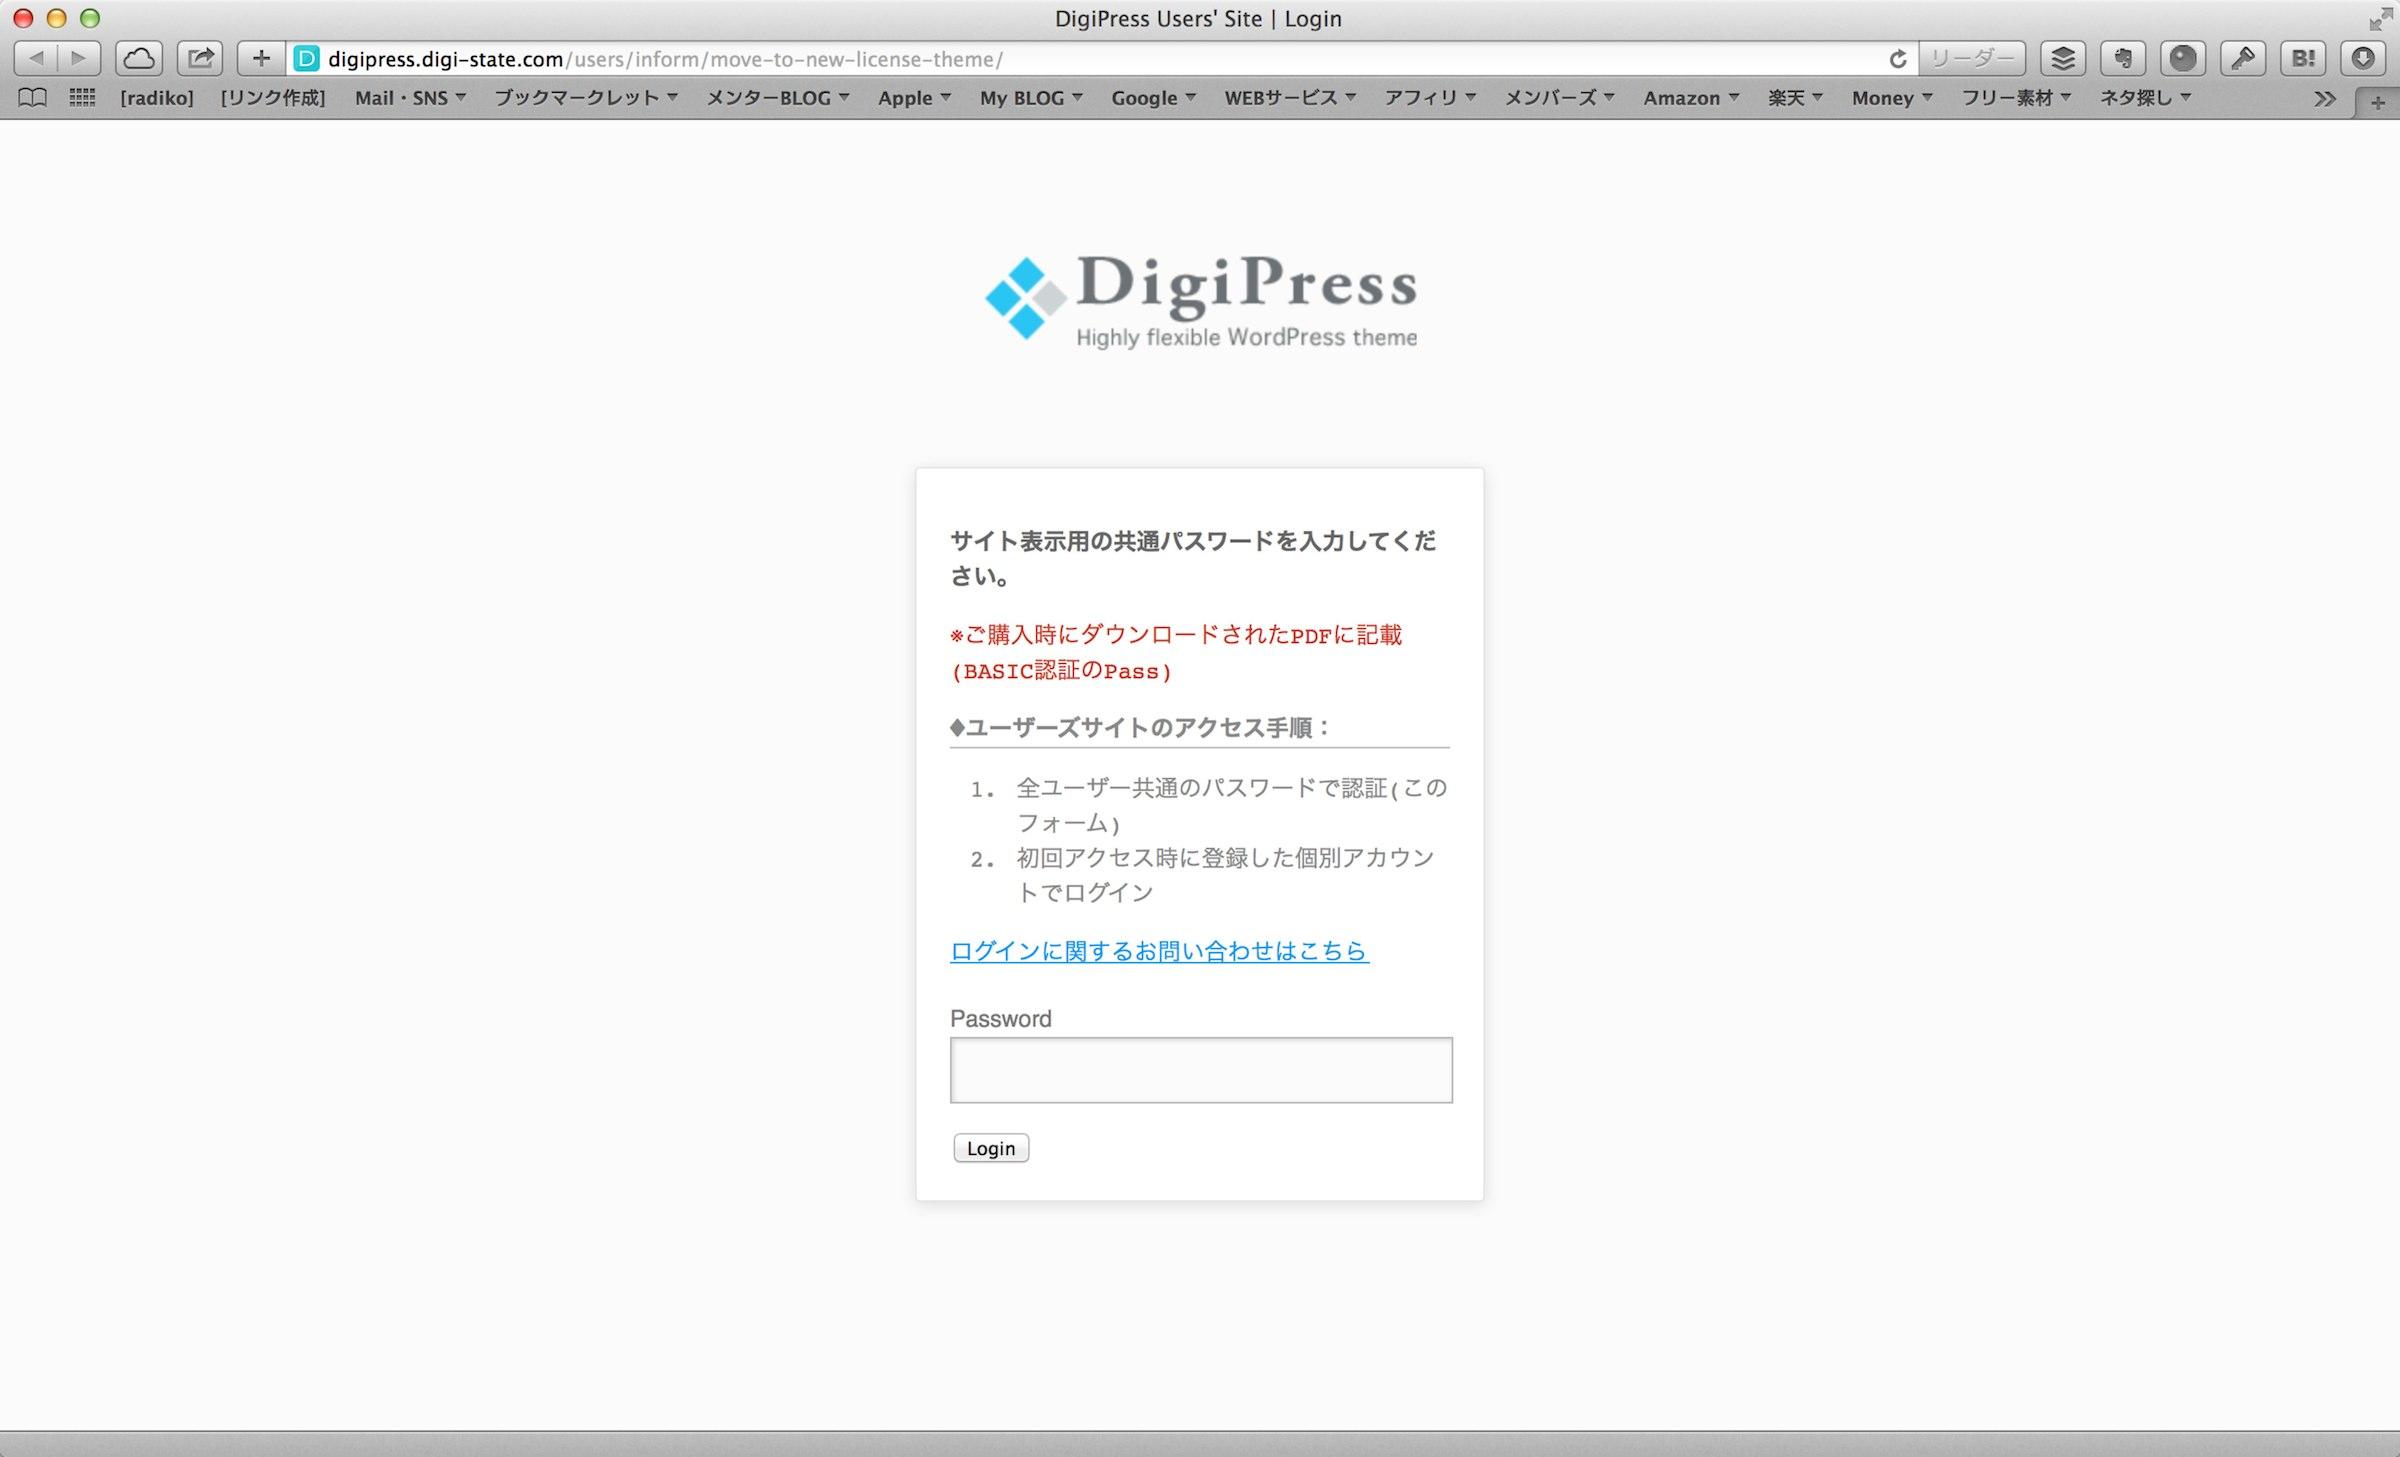 DigiPress Users_ Site | Login